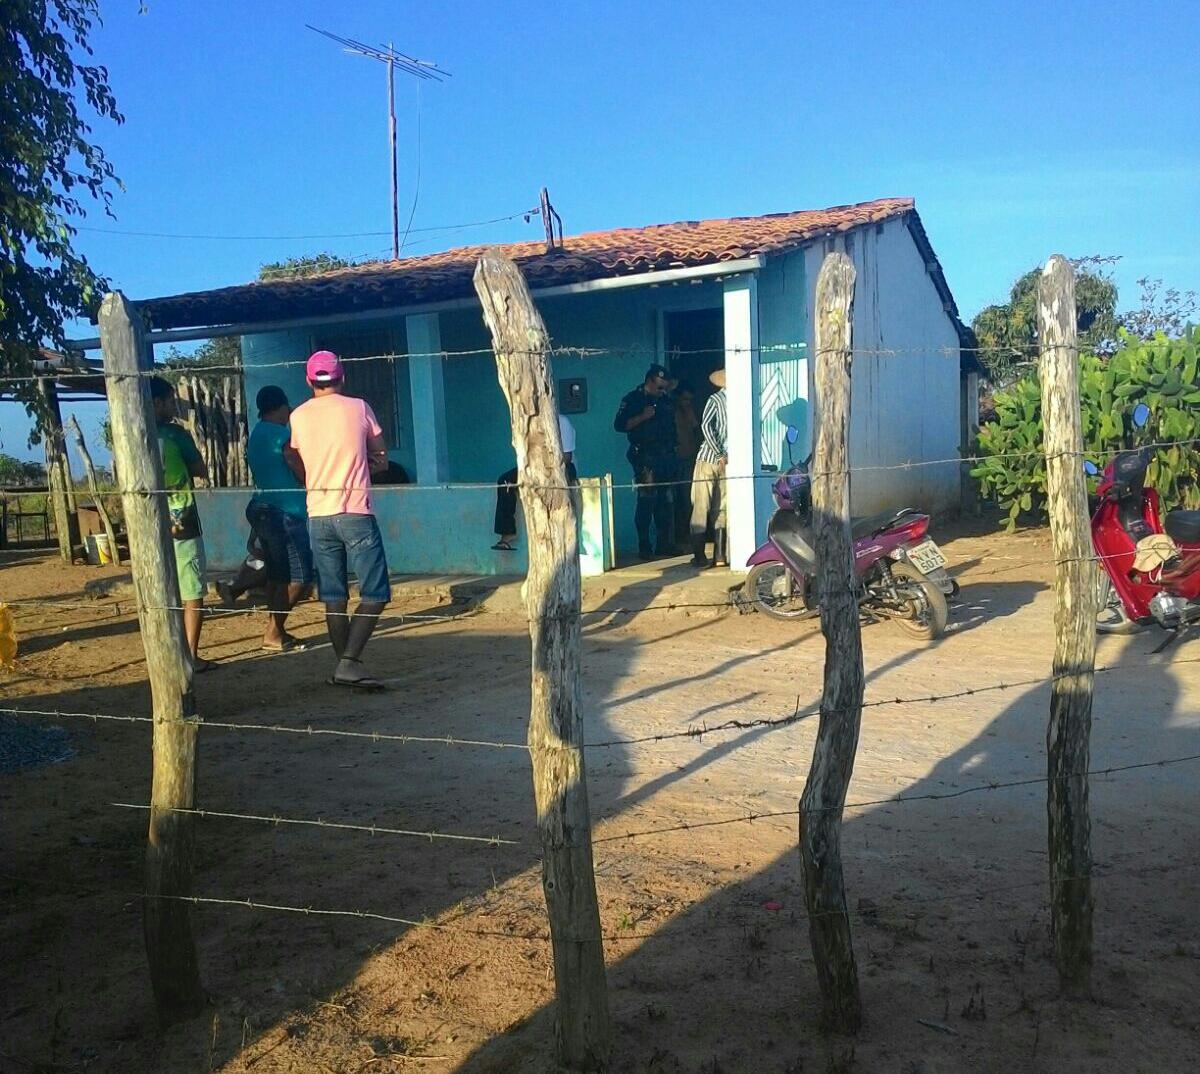 Homicídio Itabaiana sergipe arma fogo